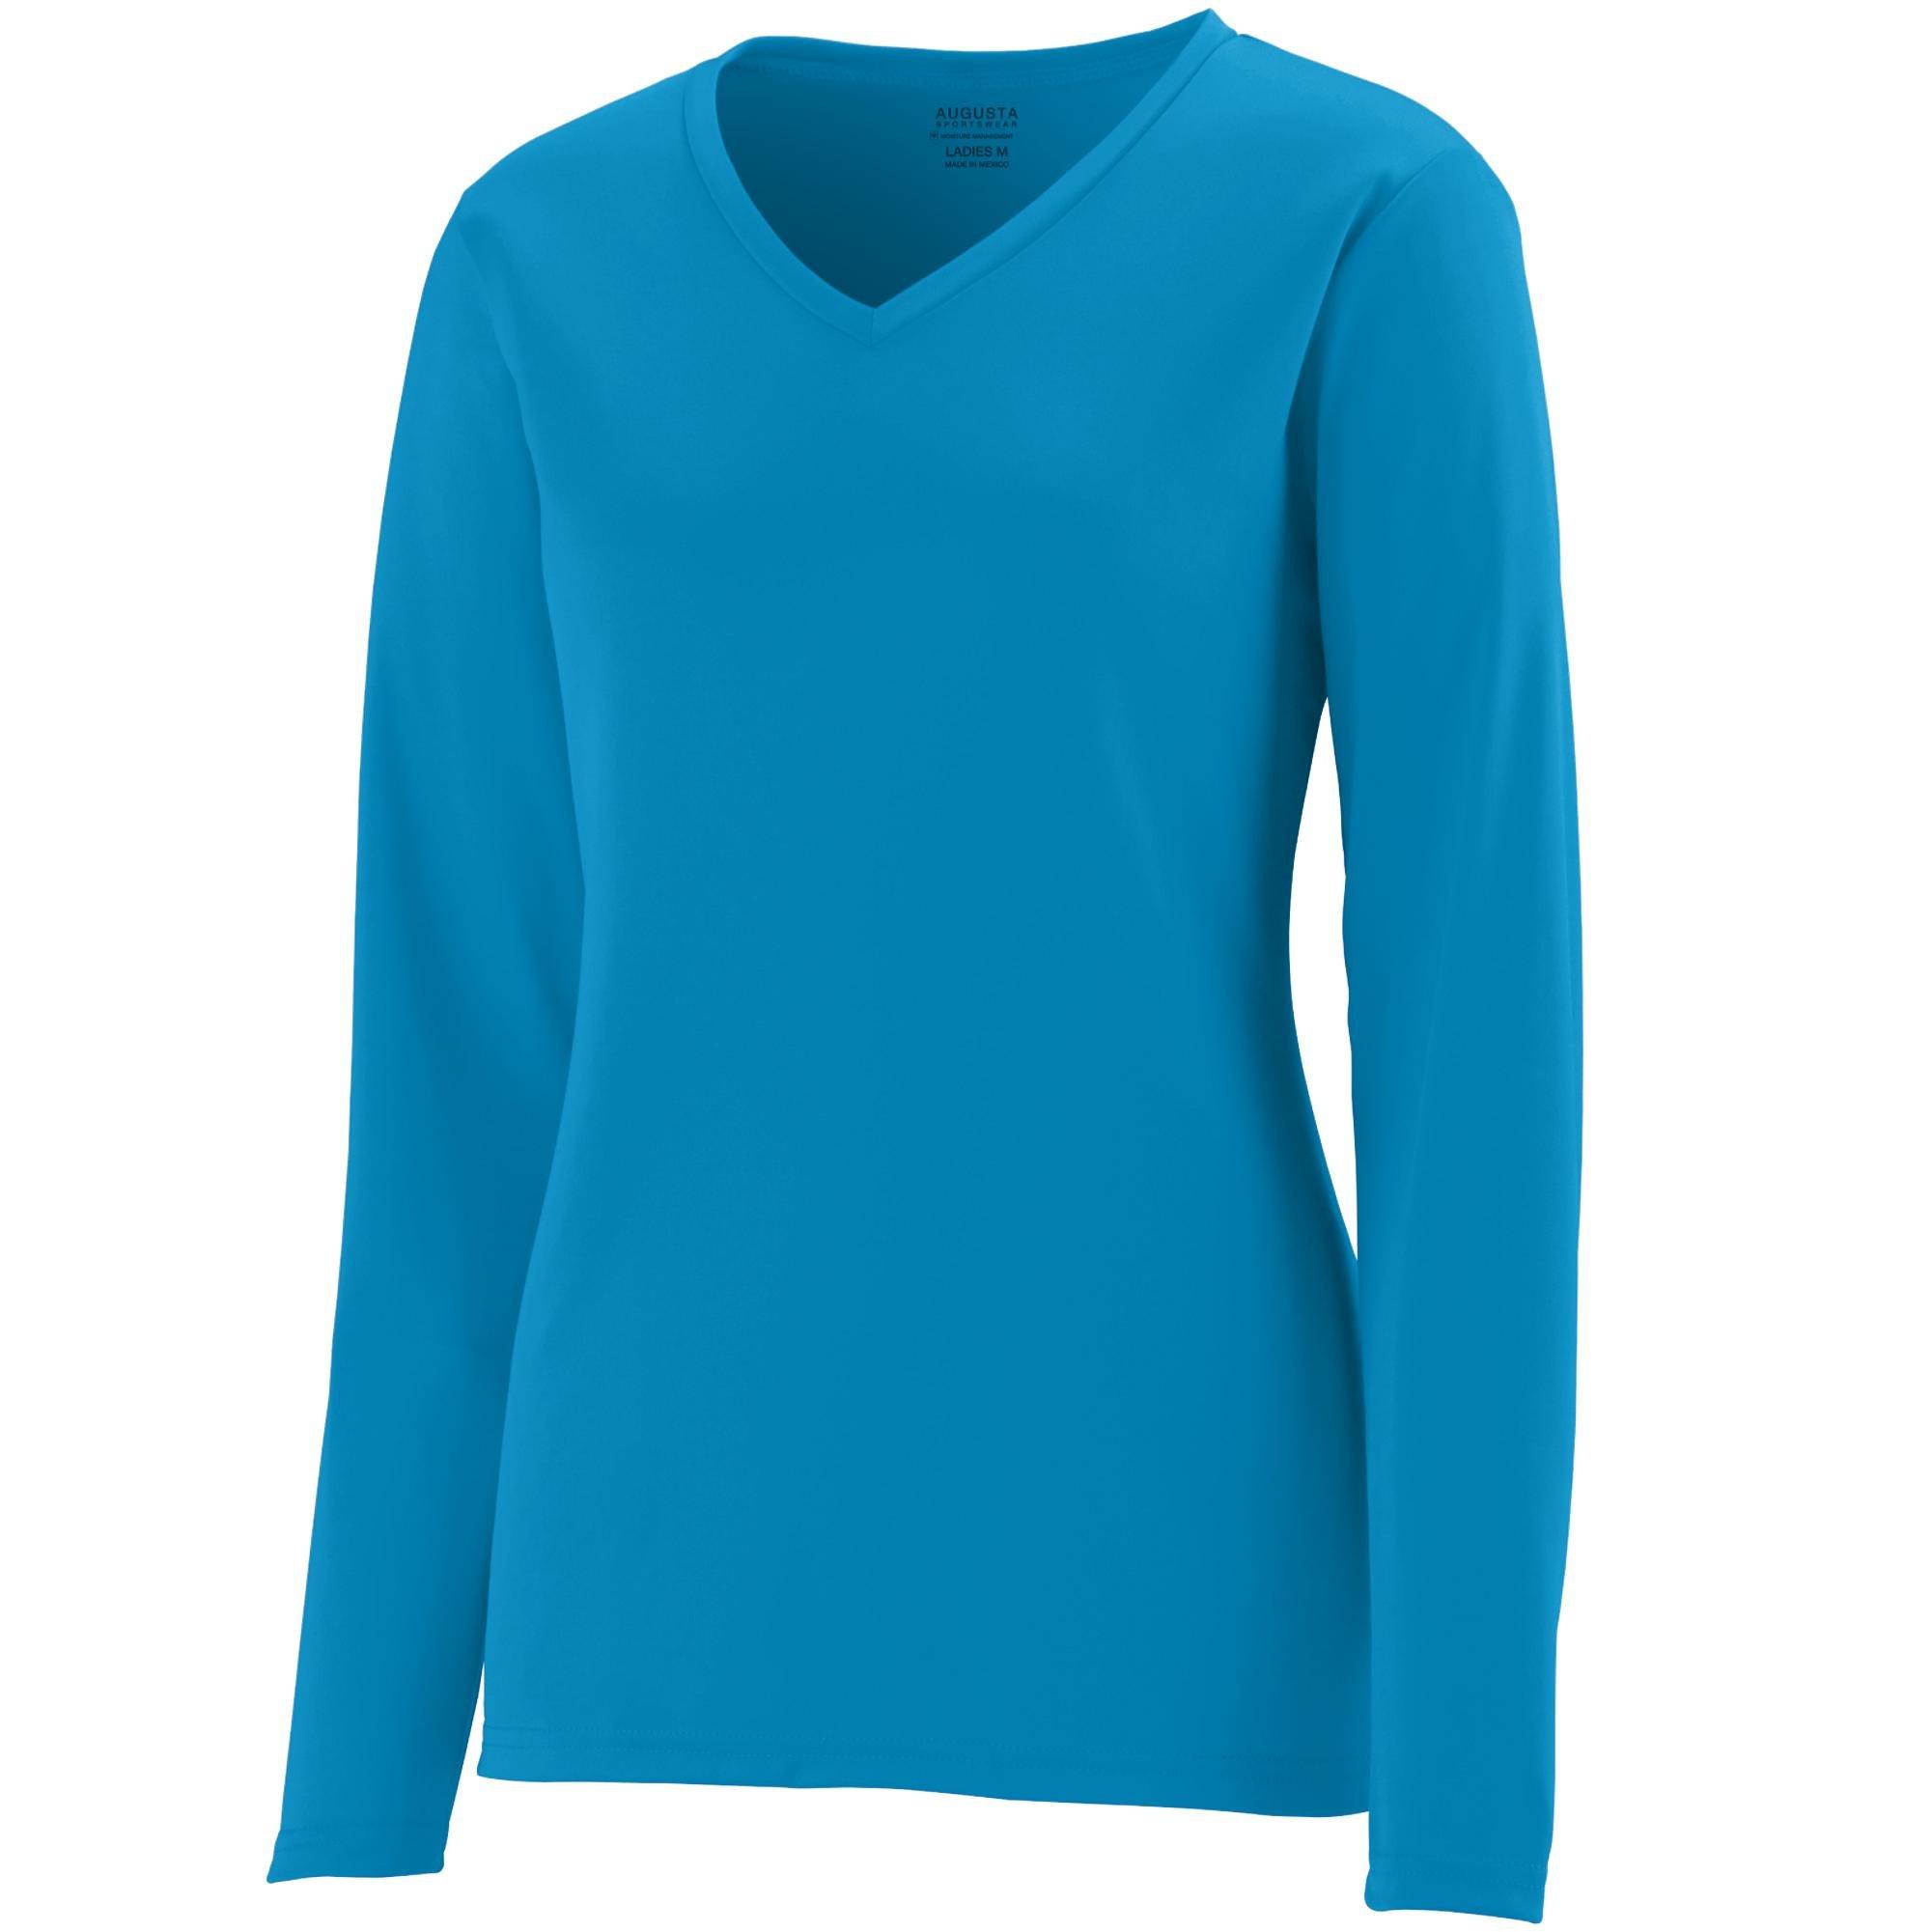 Augusta Sportswear Womens Long Sleeve Wicking T-Shirt, Power Blue, 3X-Large